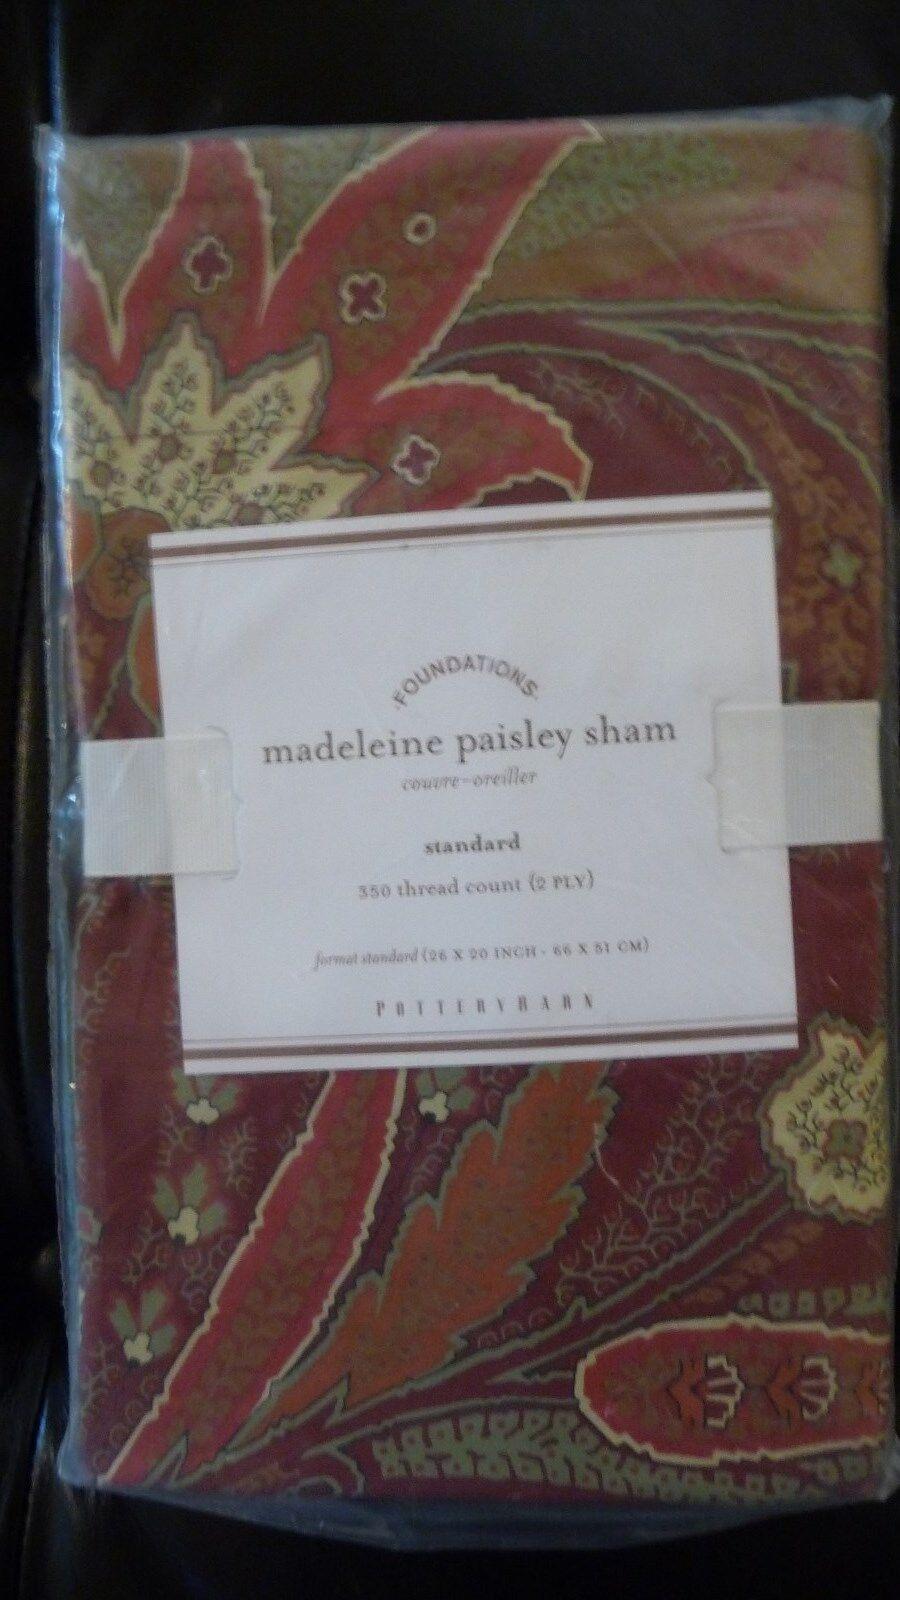 NEW Pottery Barn Madeleine Paisley Sham Standard Dark Red Pillow Cover